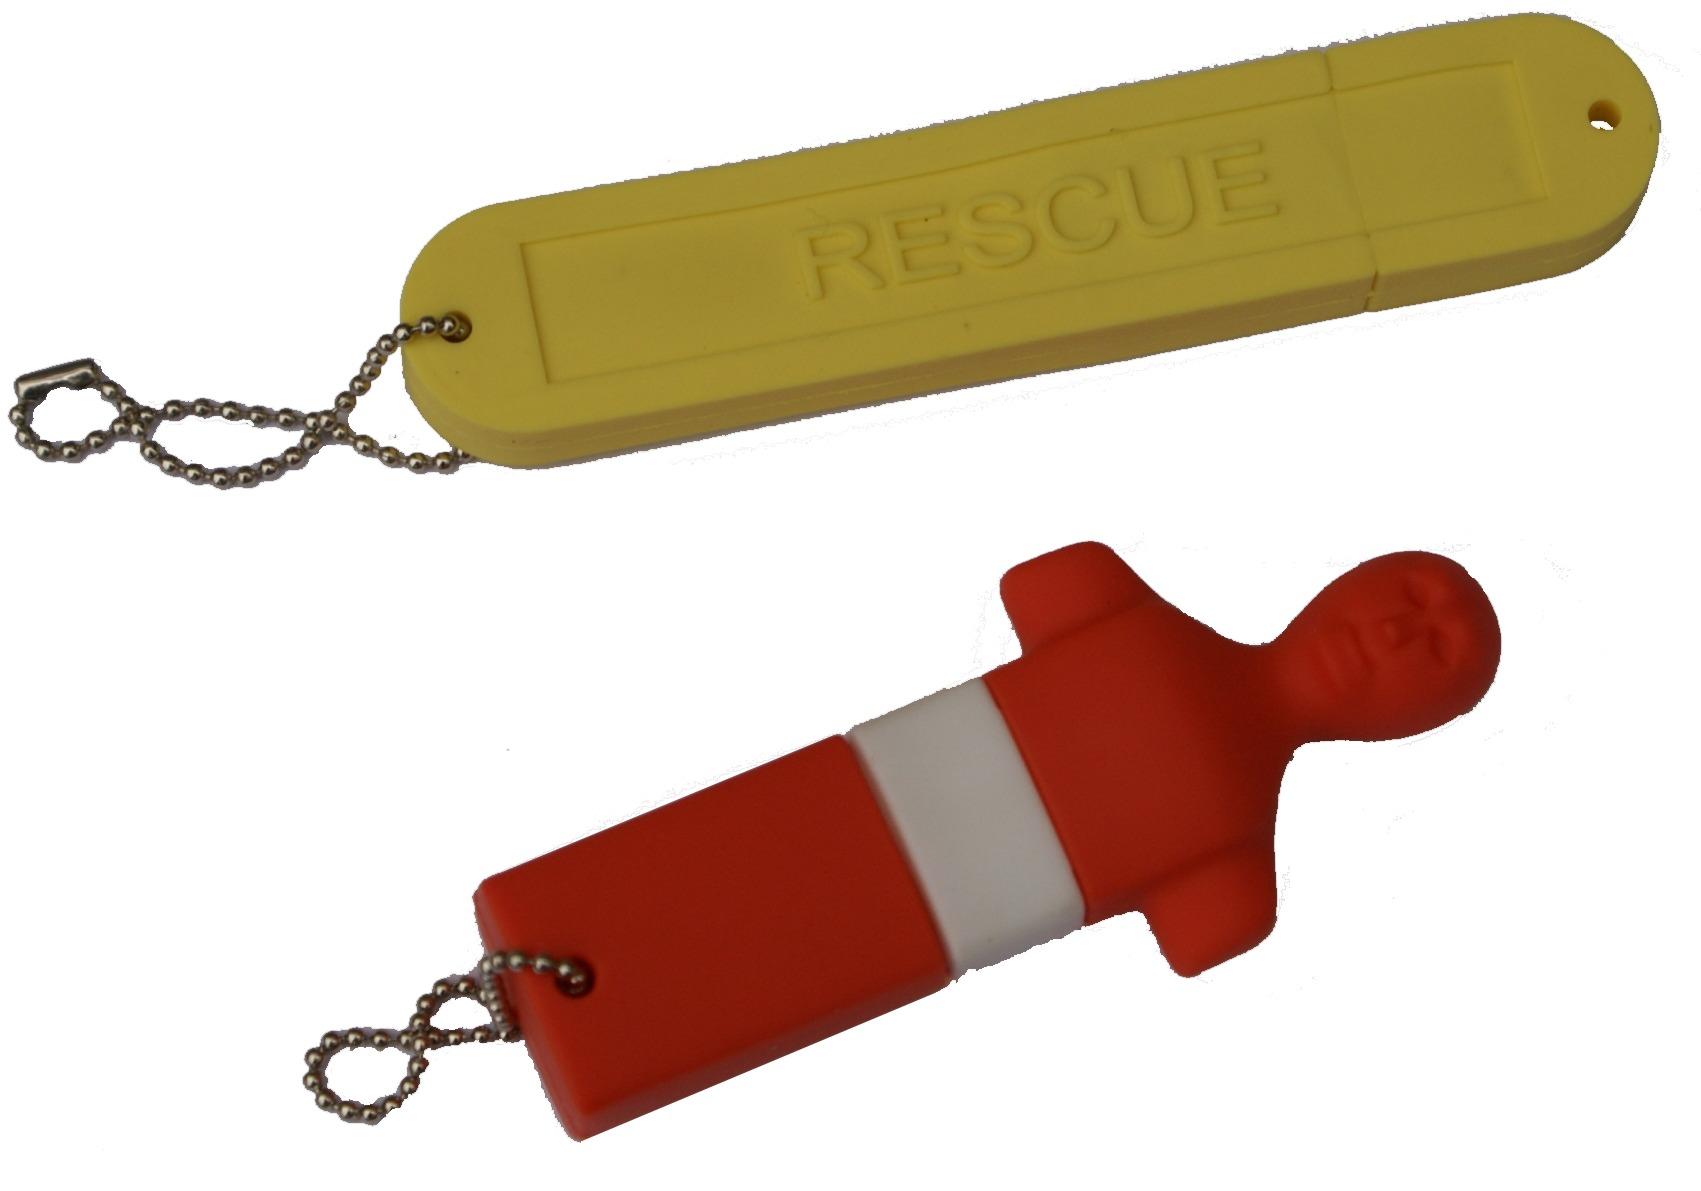 USB stick manikin and tube